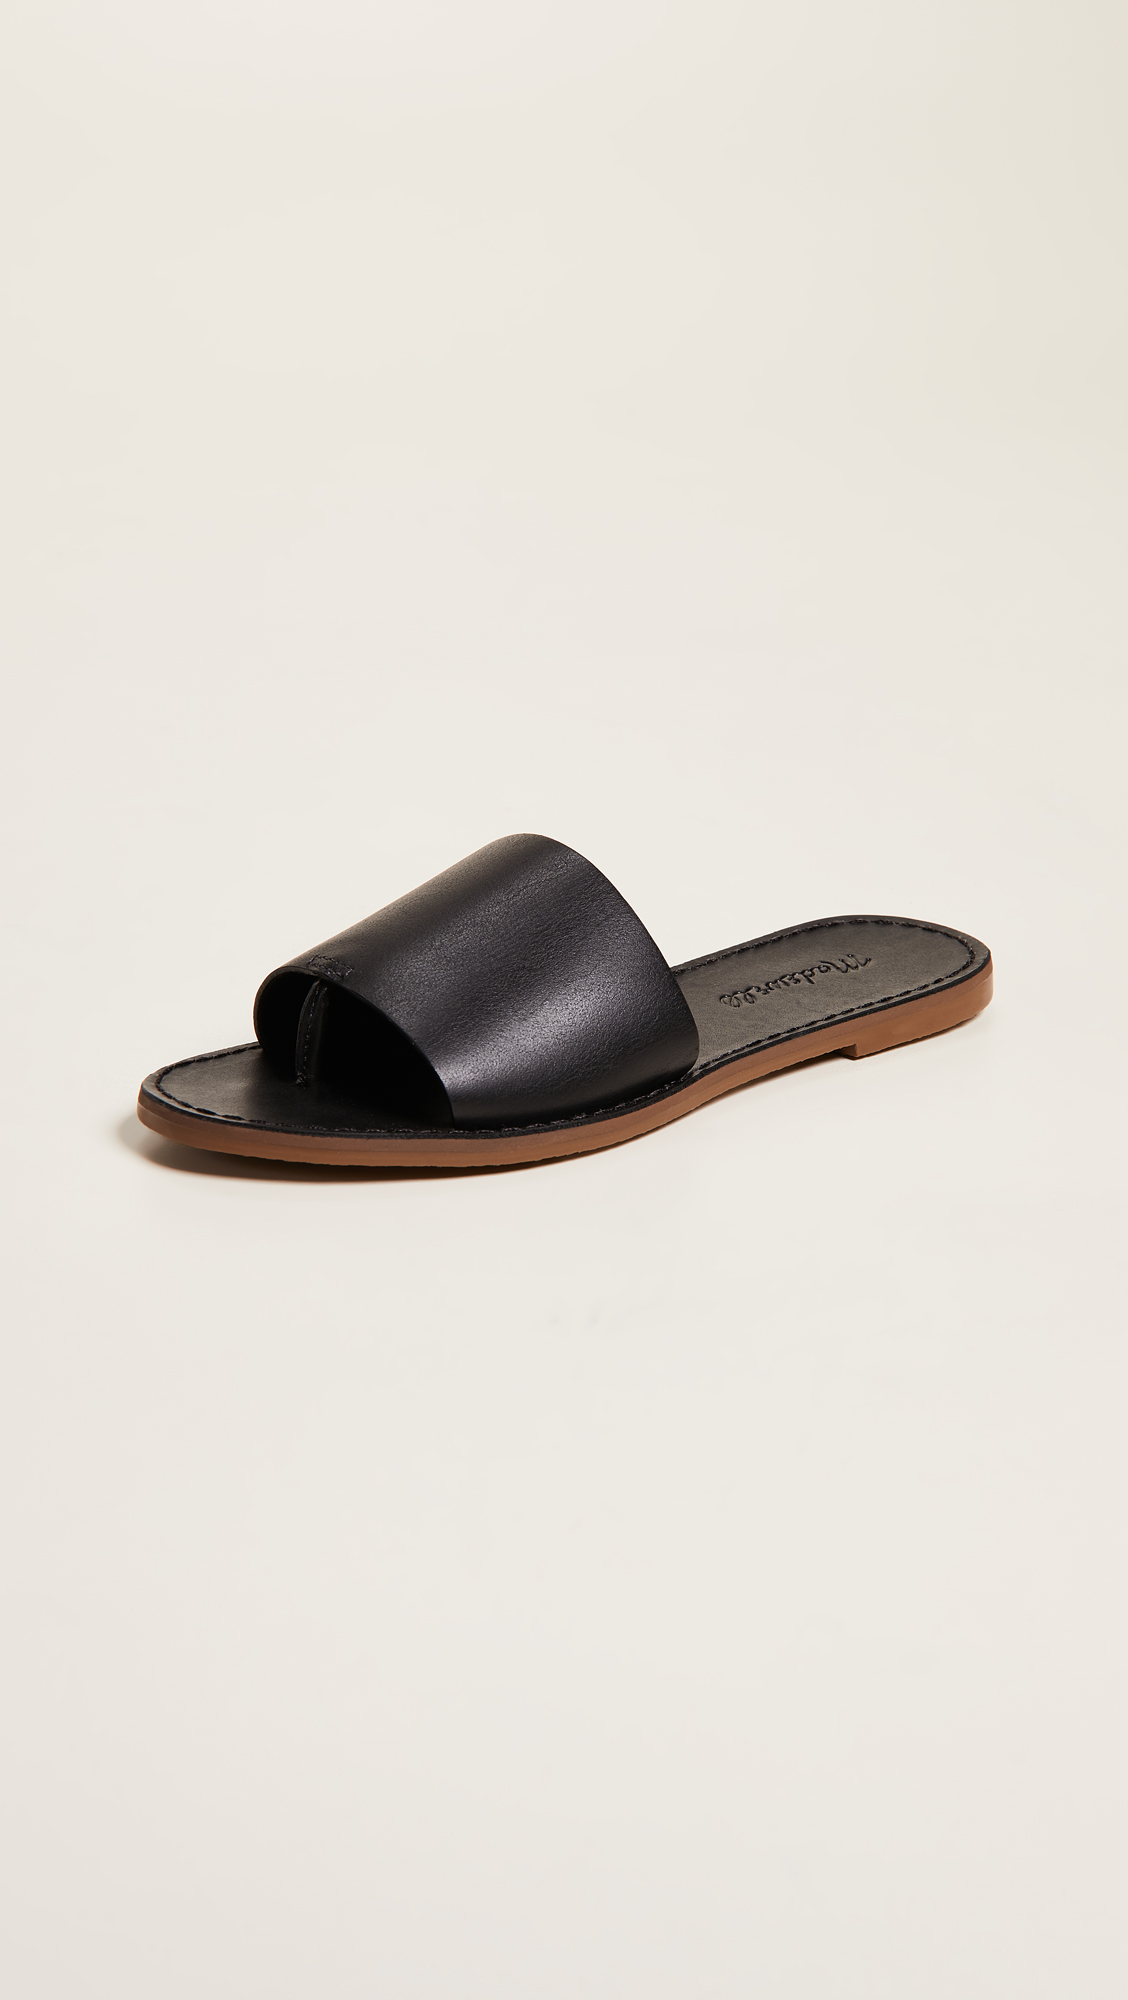 78a84404241 Madewell + The Boardwalk Post Slide Sandals